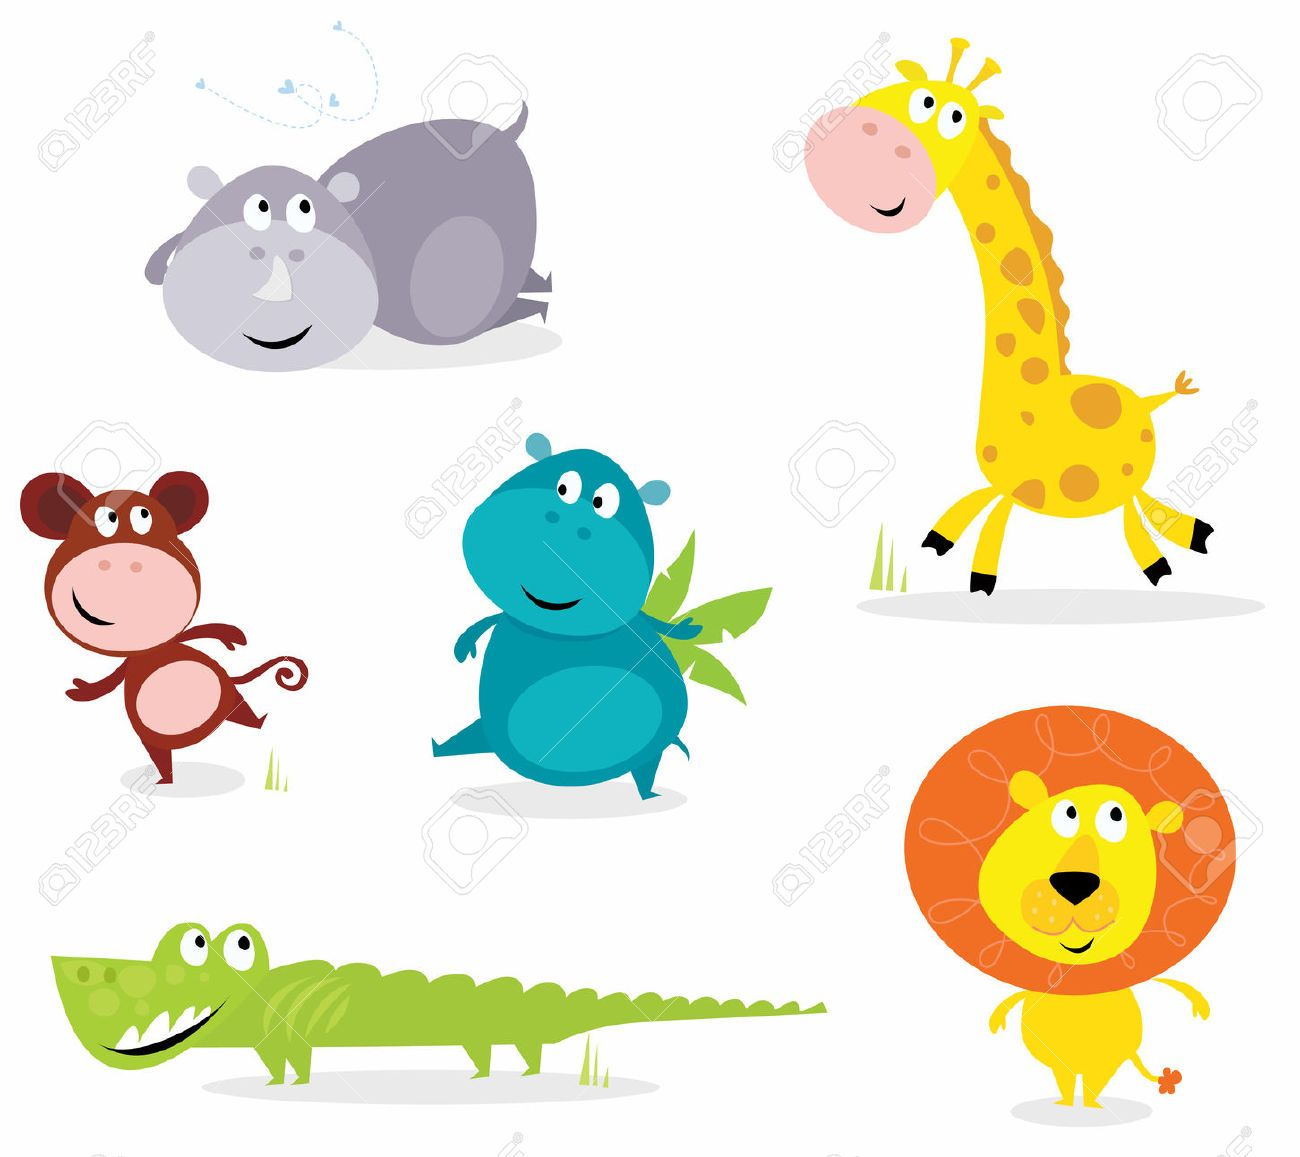 animais safari - Pesquisa Google